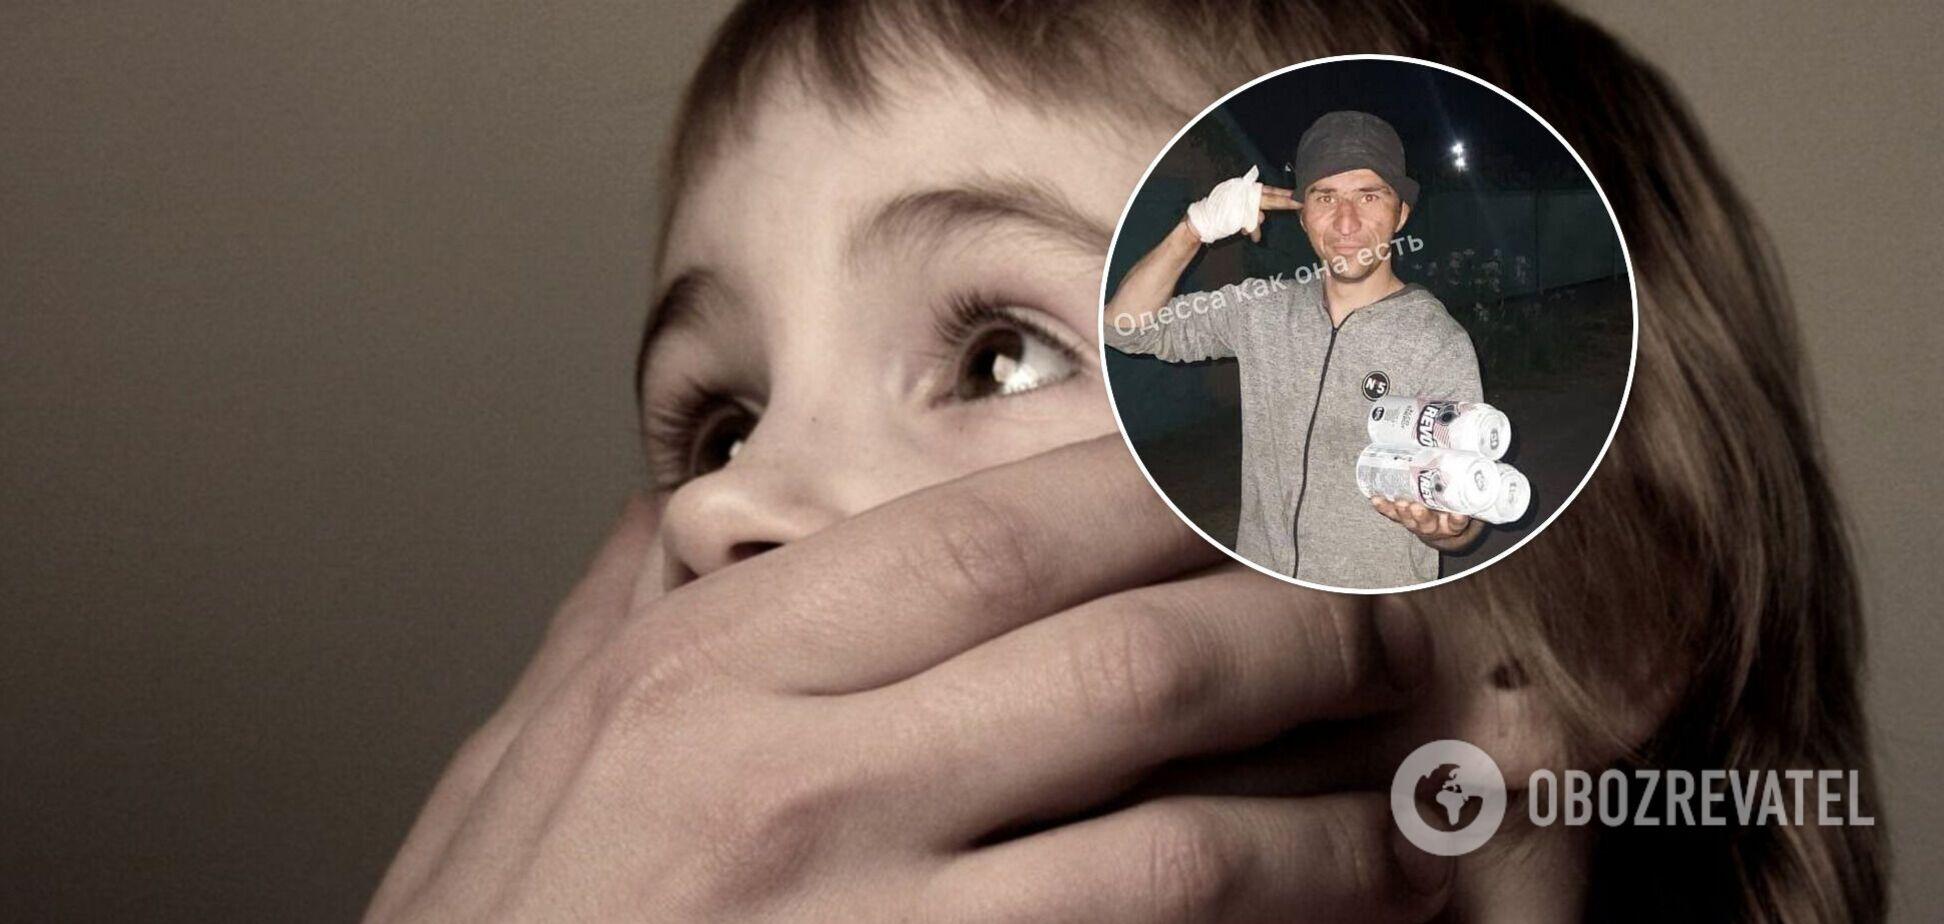 На Одесчине мужчина изнасиловал восьмилетнюю девочку. Фото подозреваемого